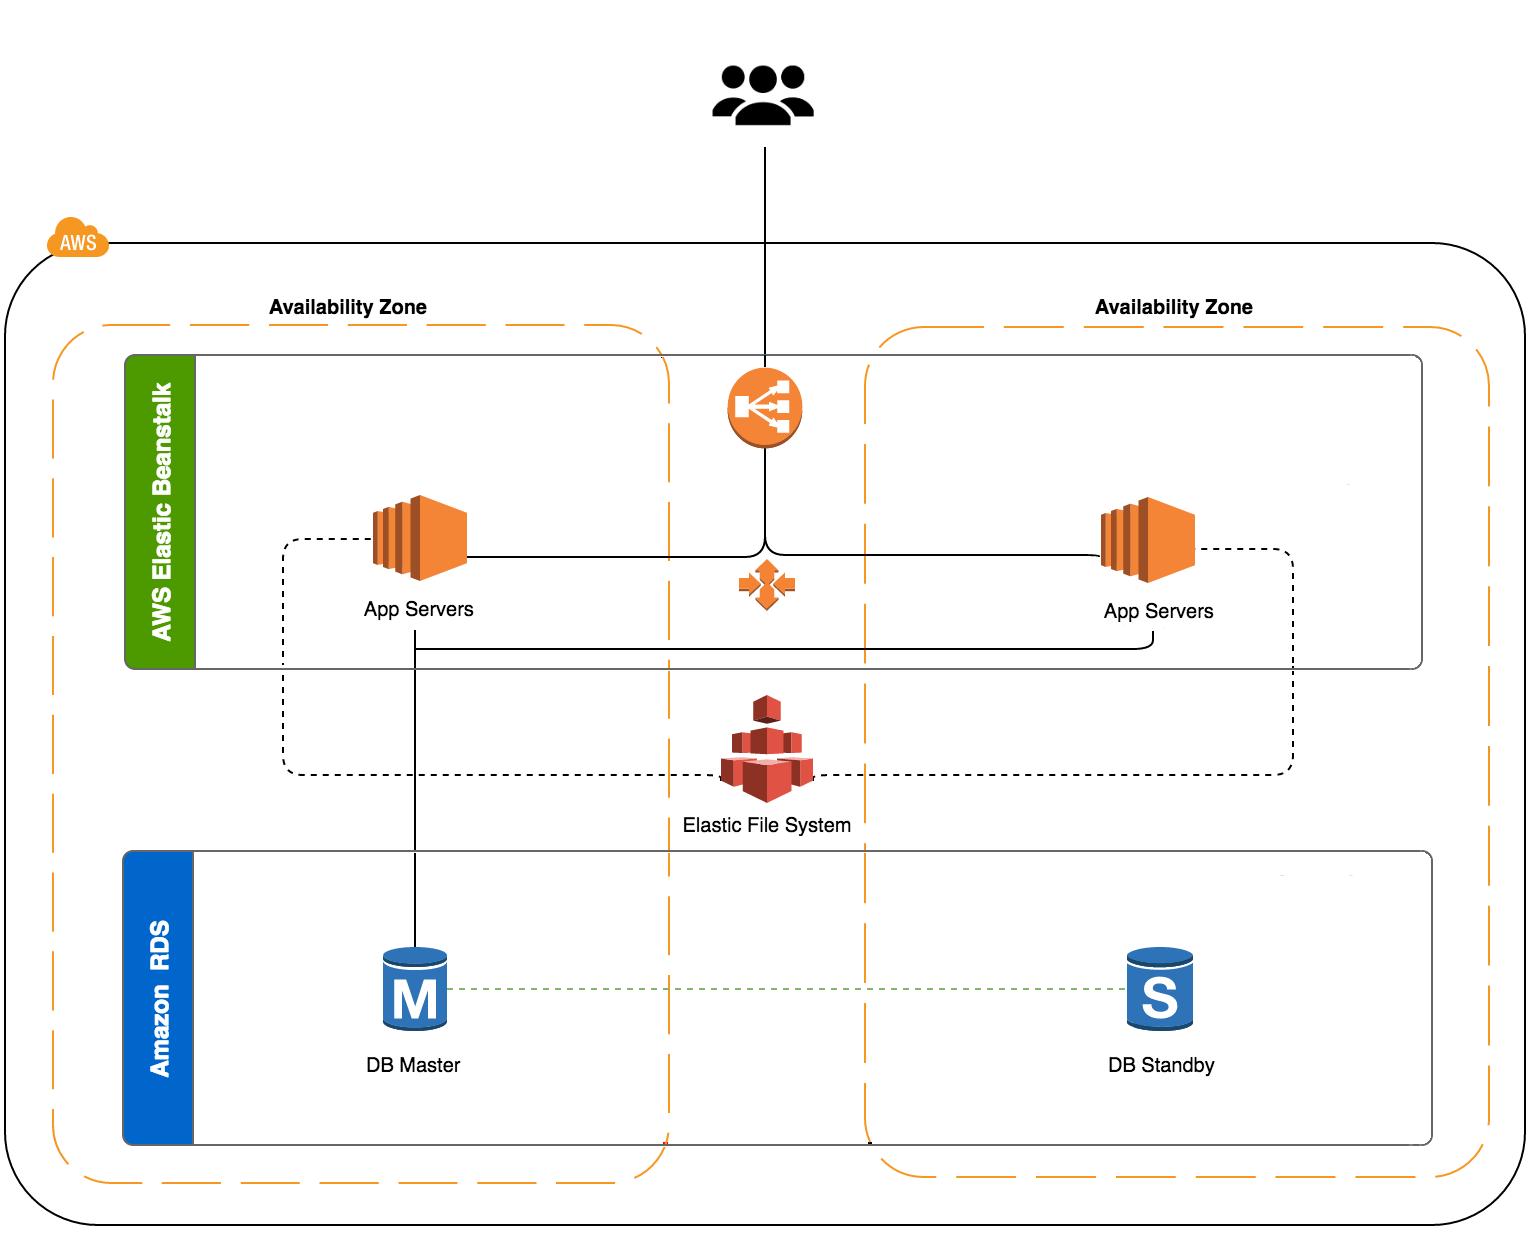 Aws architecture diagram tool smartdraw diagrams for Drupal 7 architecture diagram